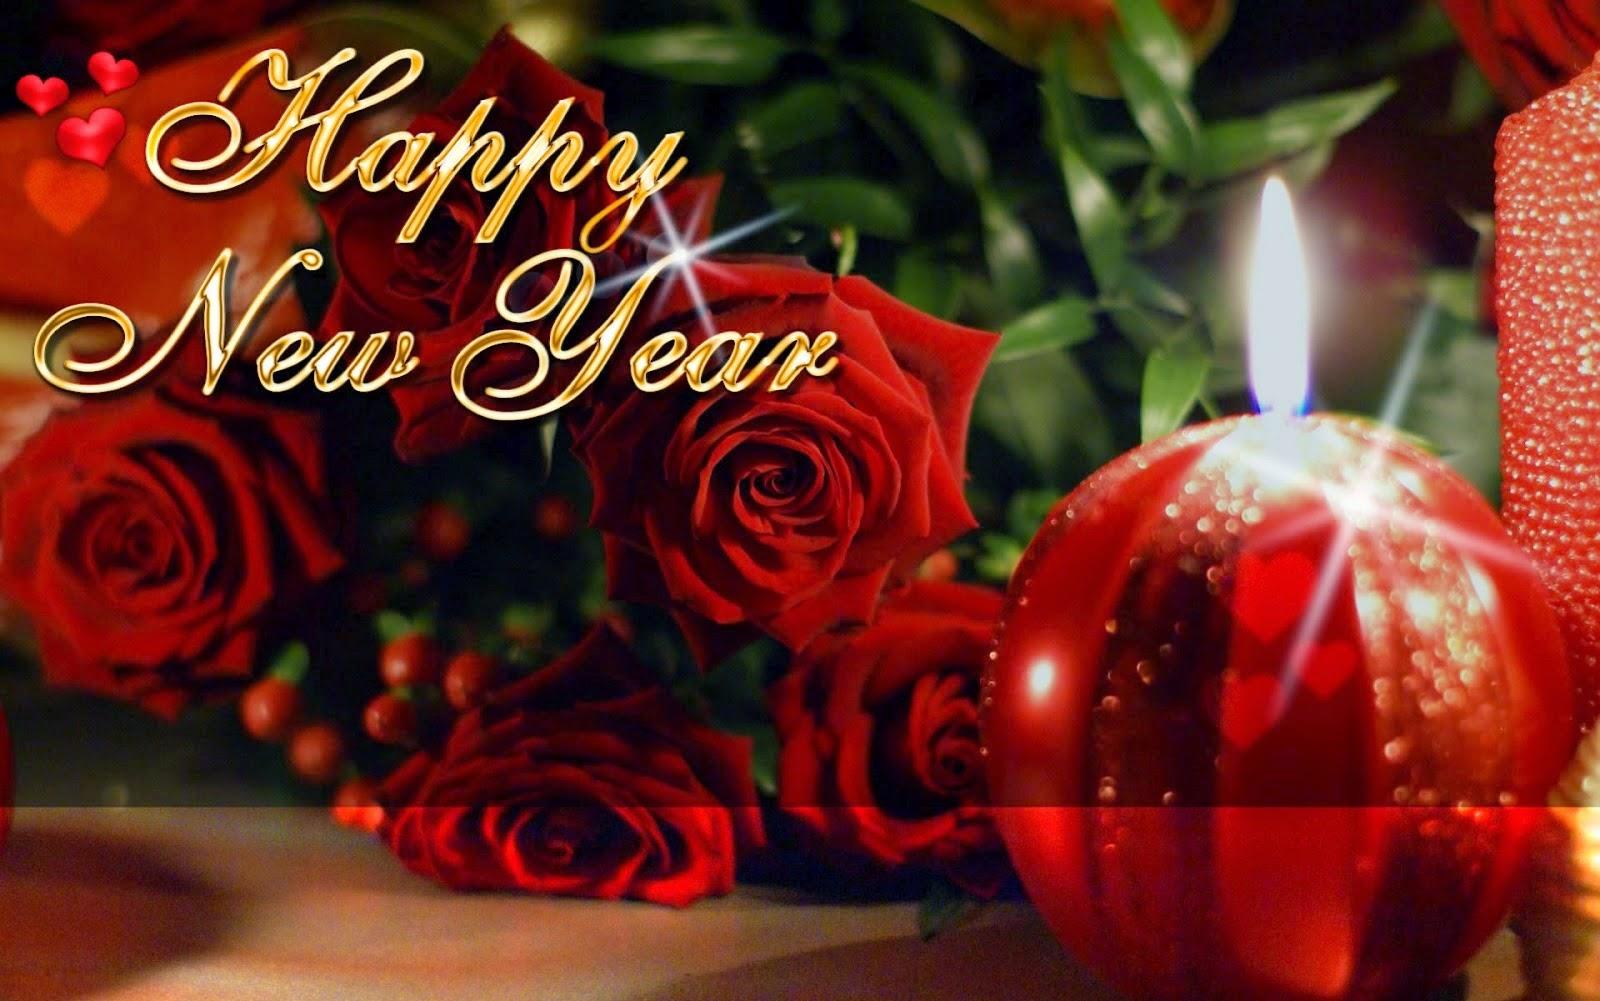 1600x1001 Px 2018 Wallpaper Happy New Year 2018 Happy New Year Wallpapers  Hd New Years Wallpapers